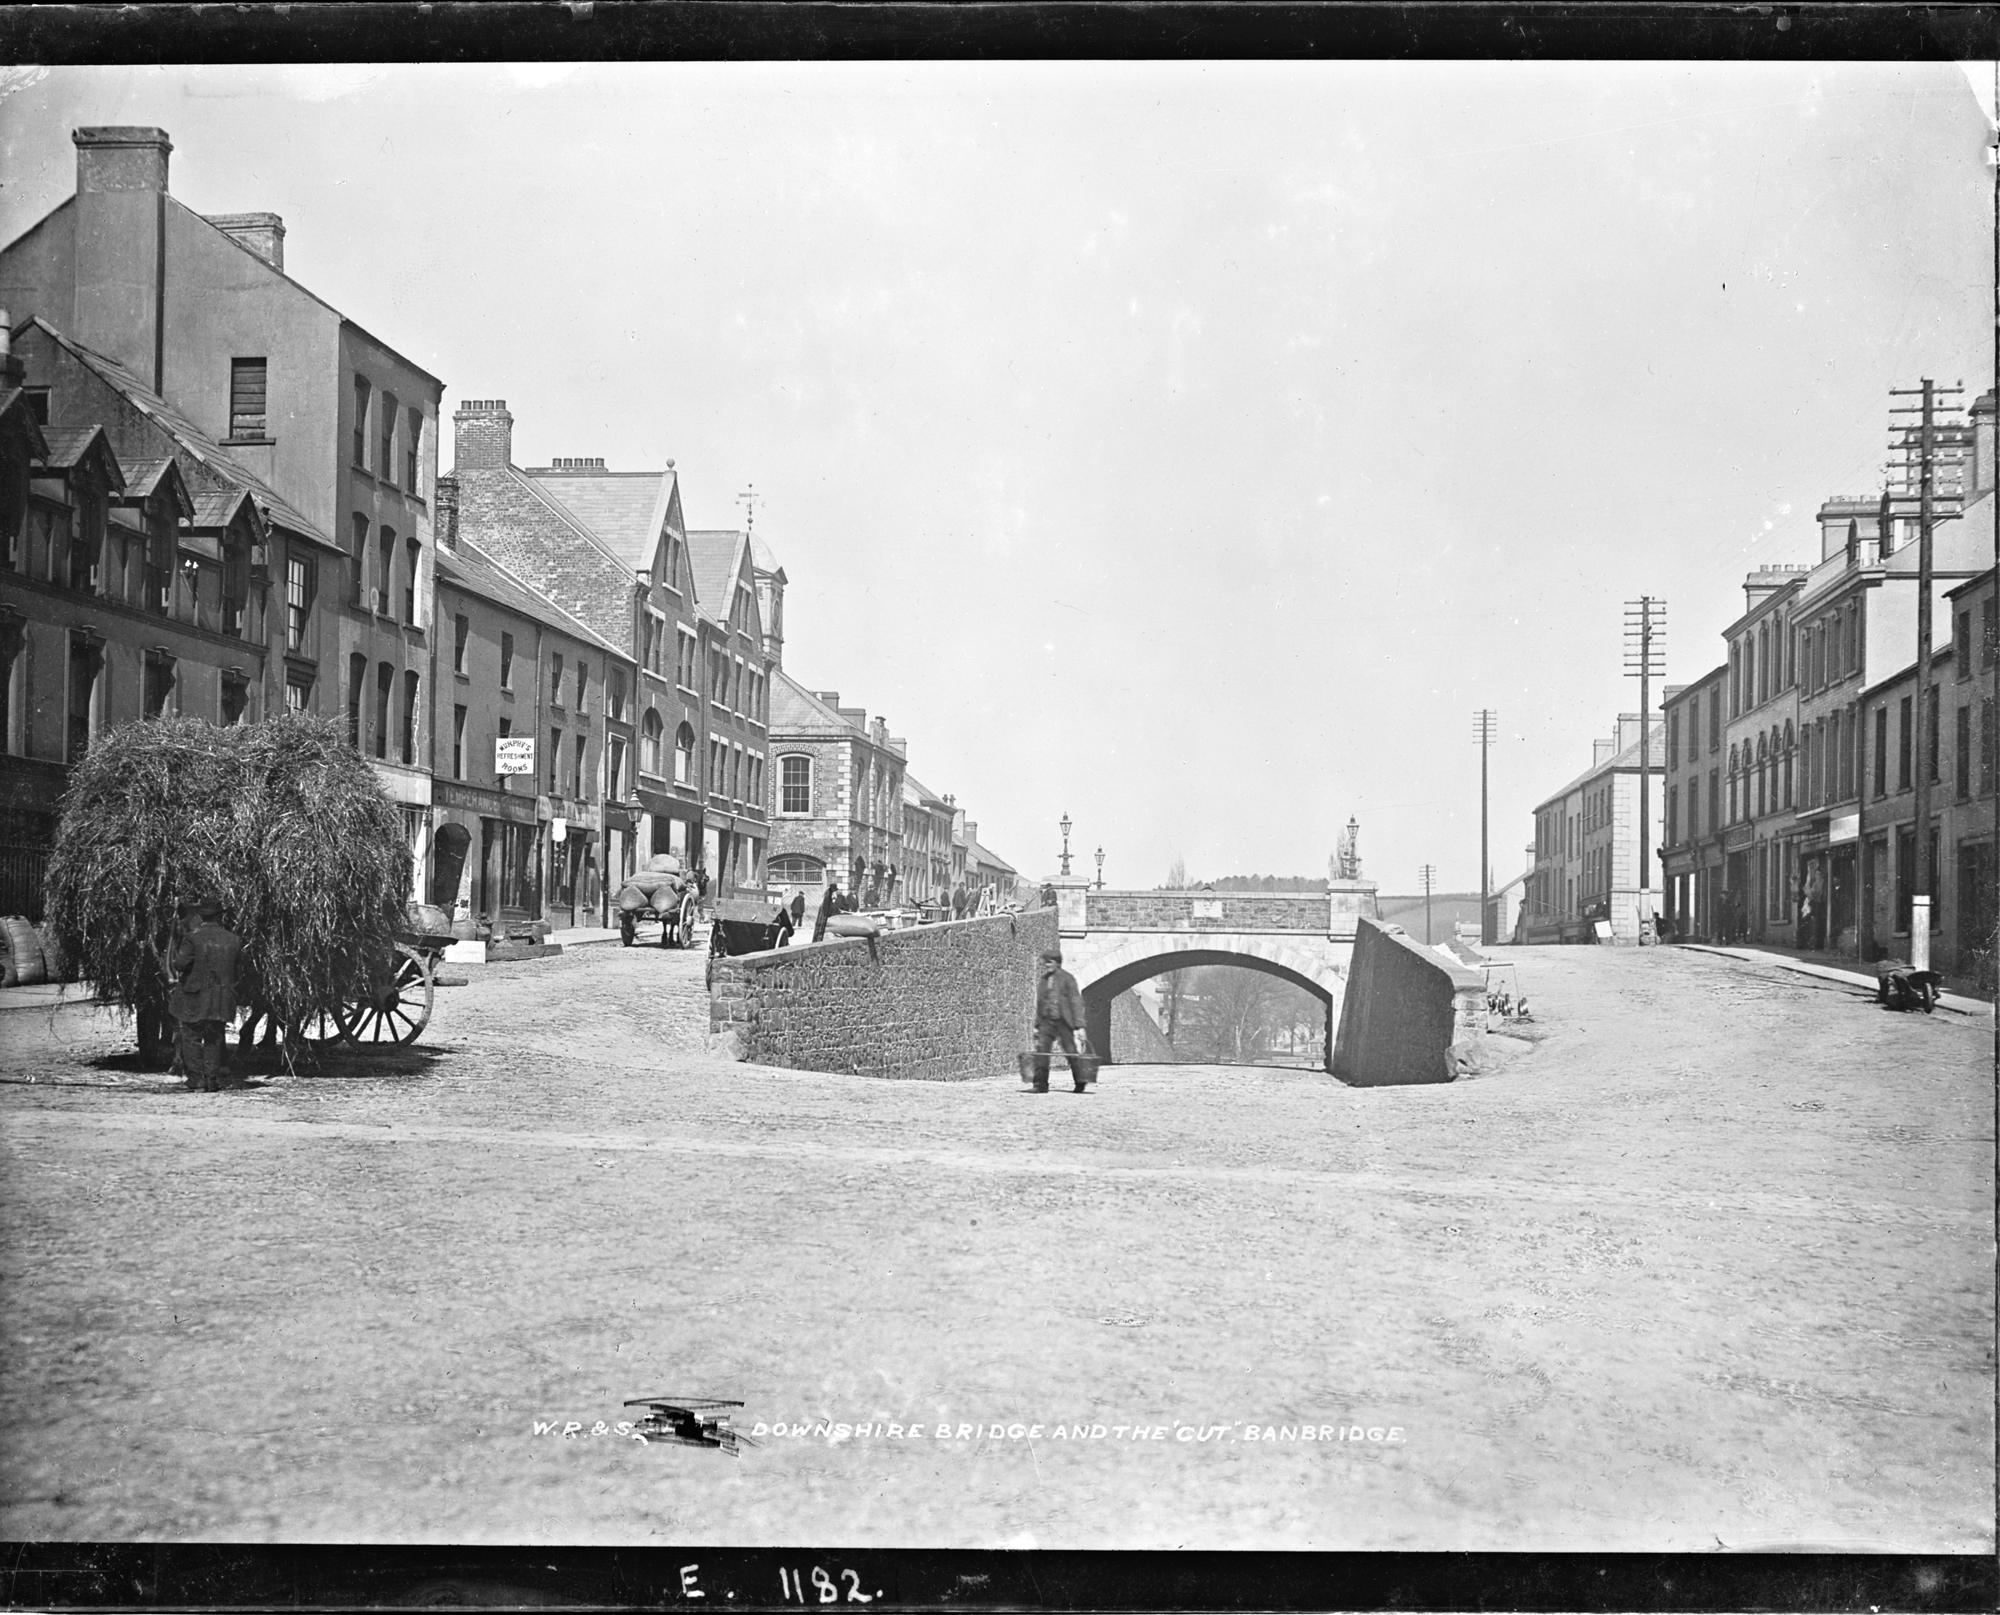 Downshire Bridge and the Cut, Banbridge, Co. Down